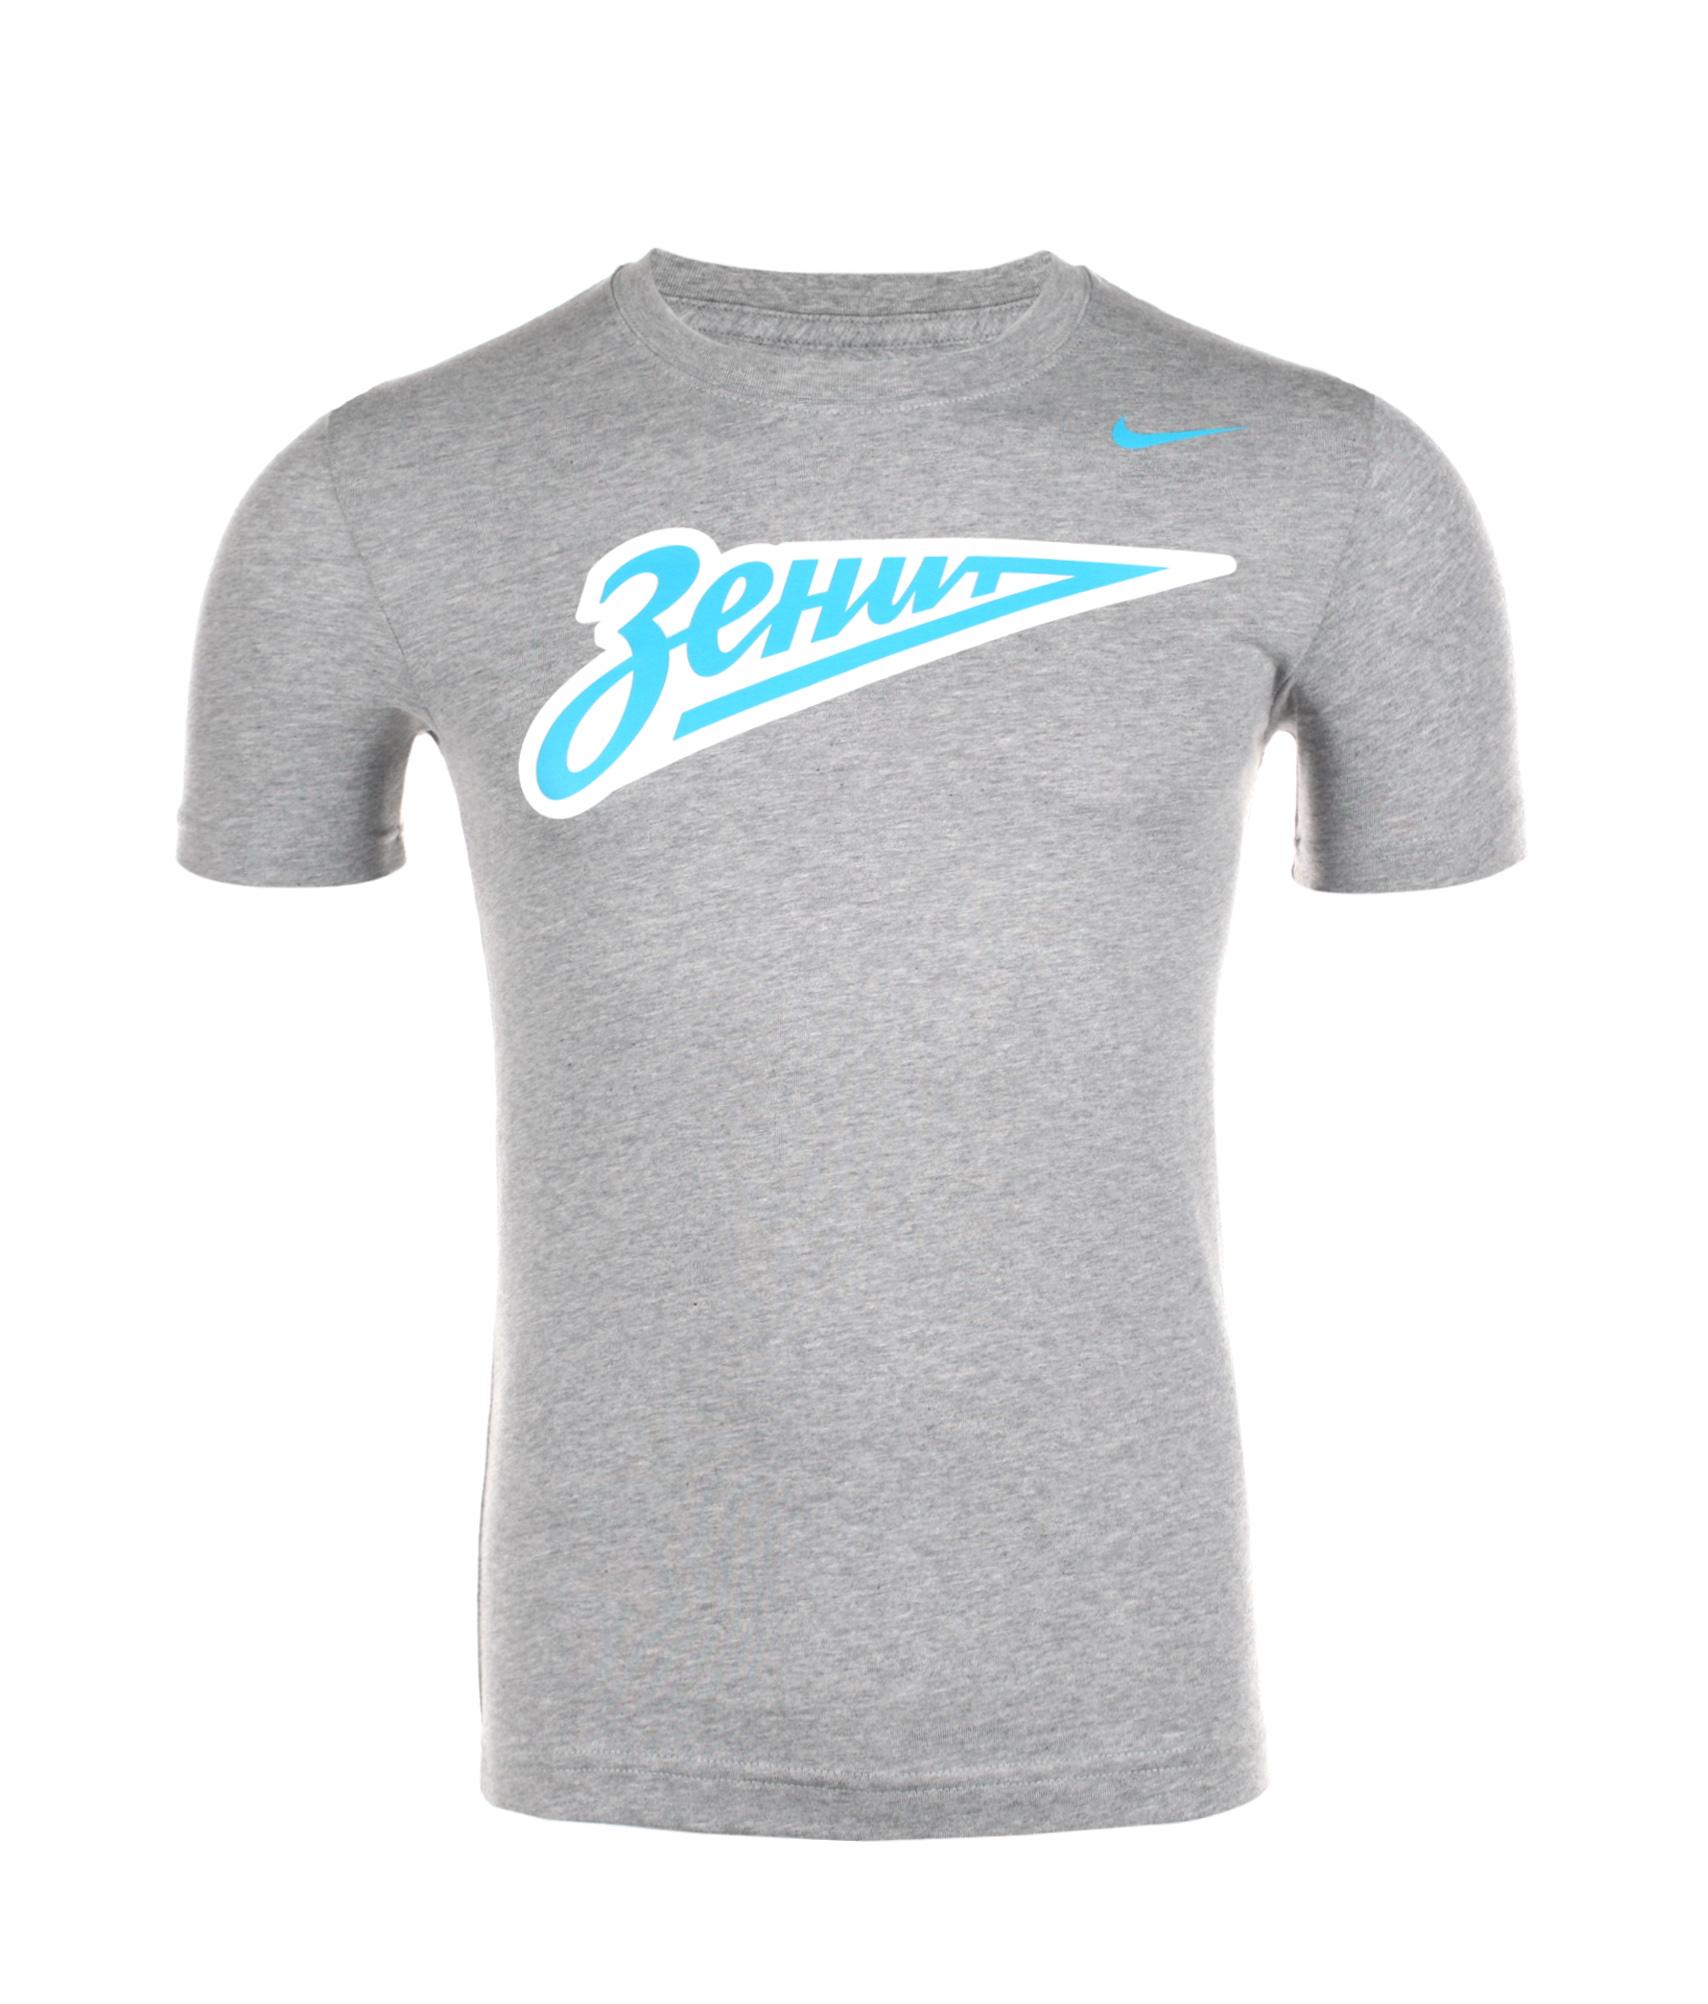 Футболка Nike ZENIT CORE BASIC CREST TEE, Цвет-Серый, Размер-L